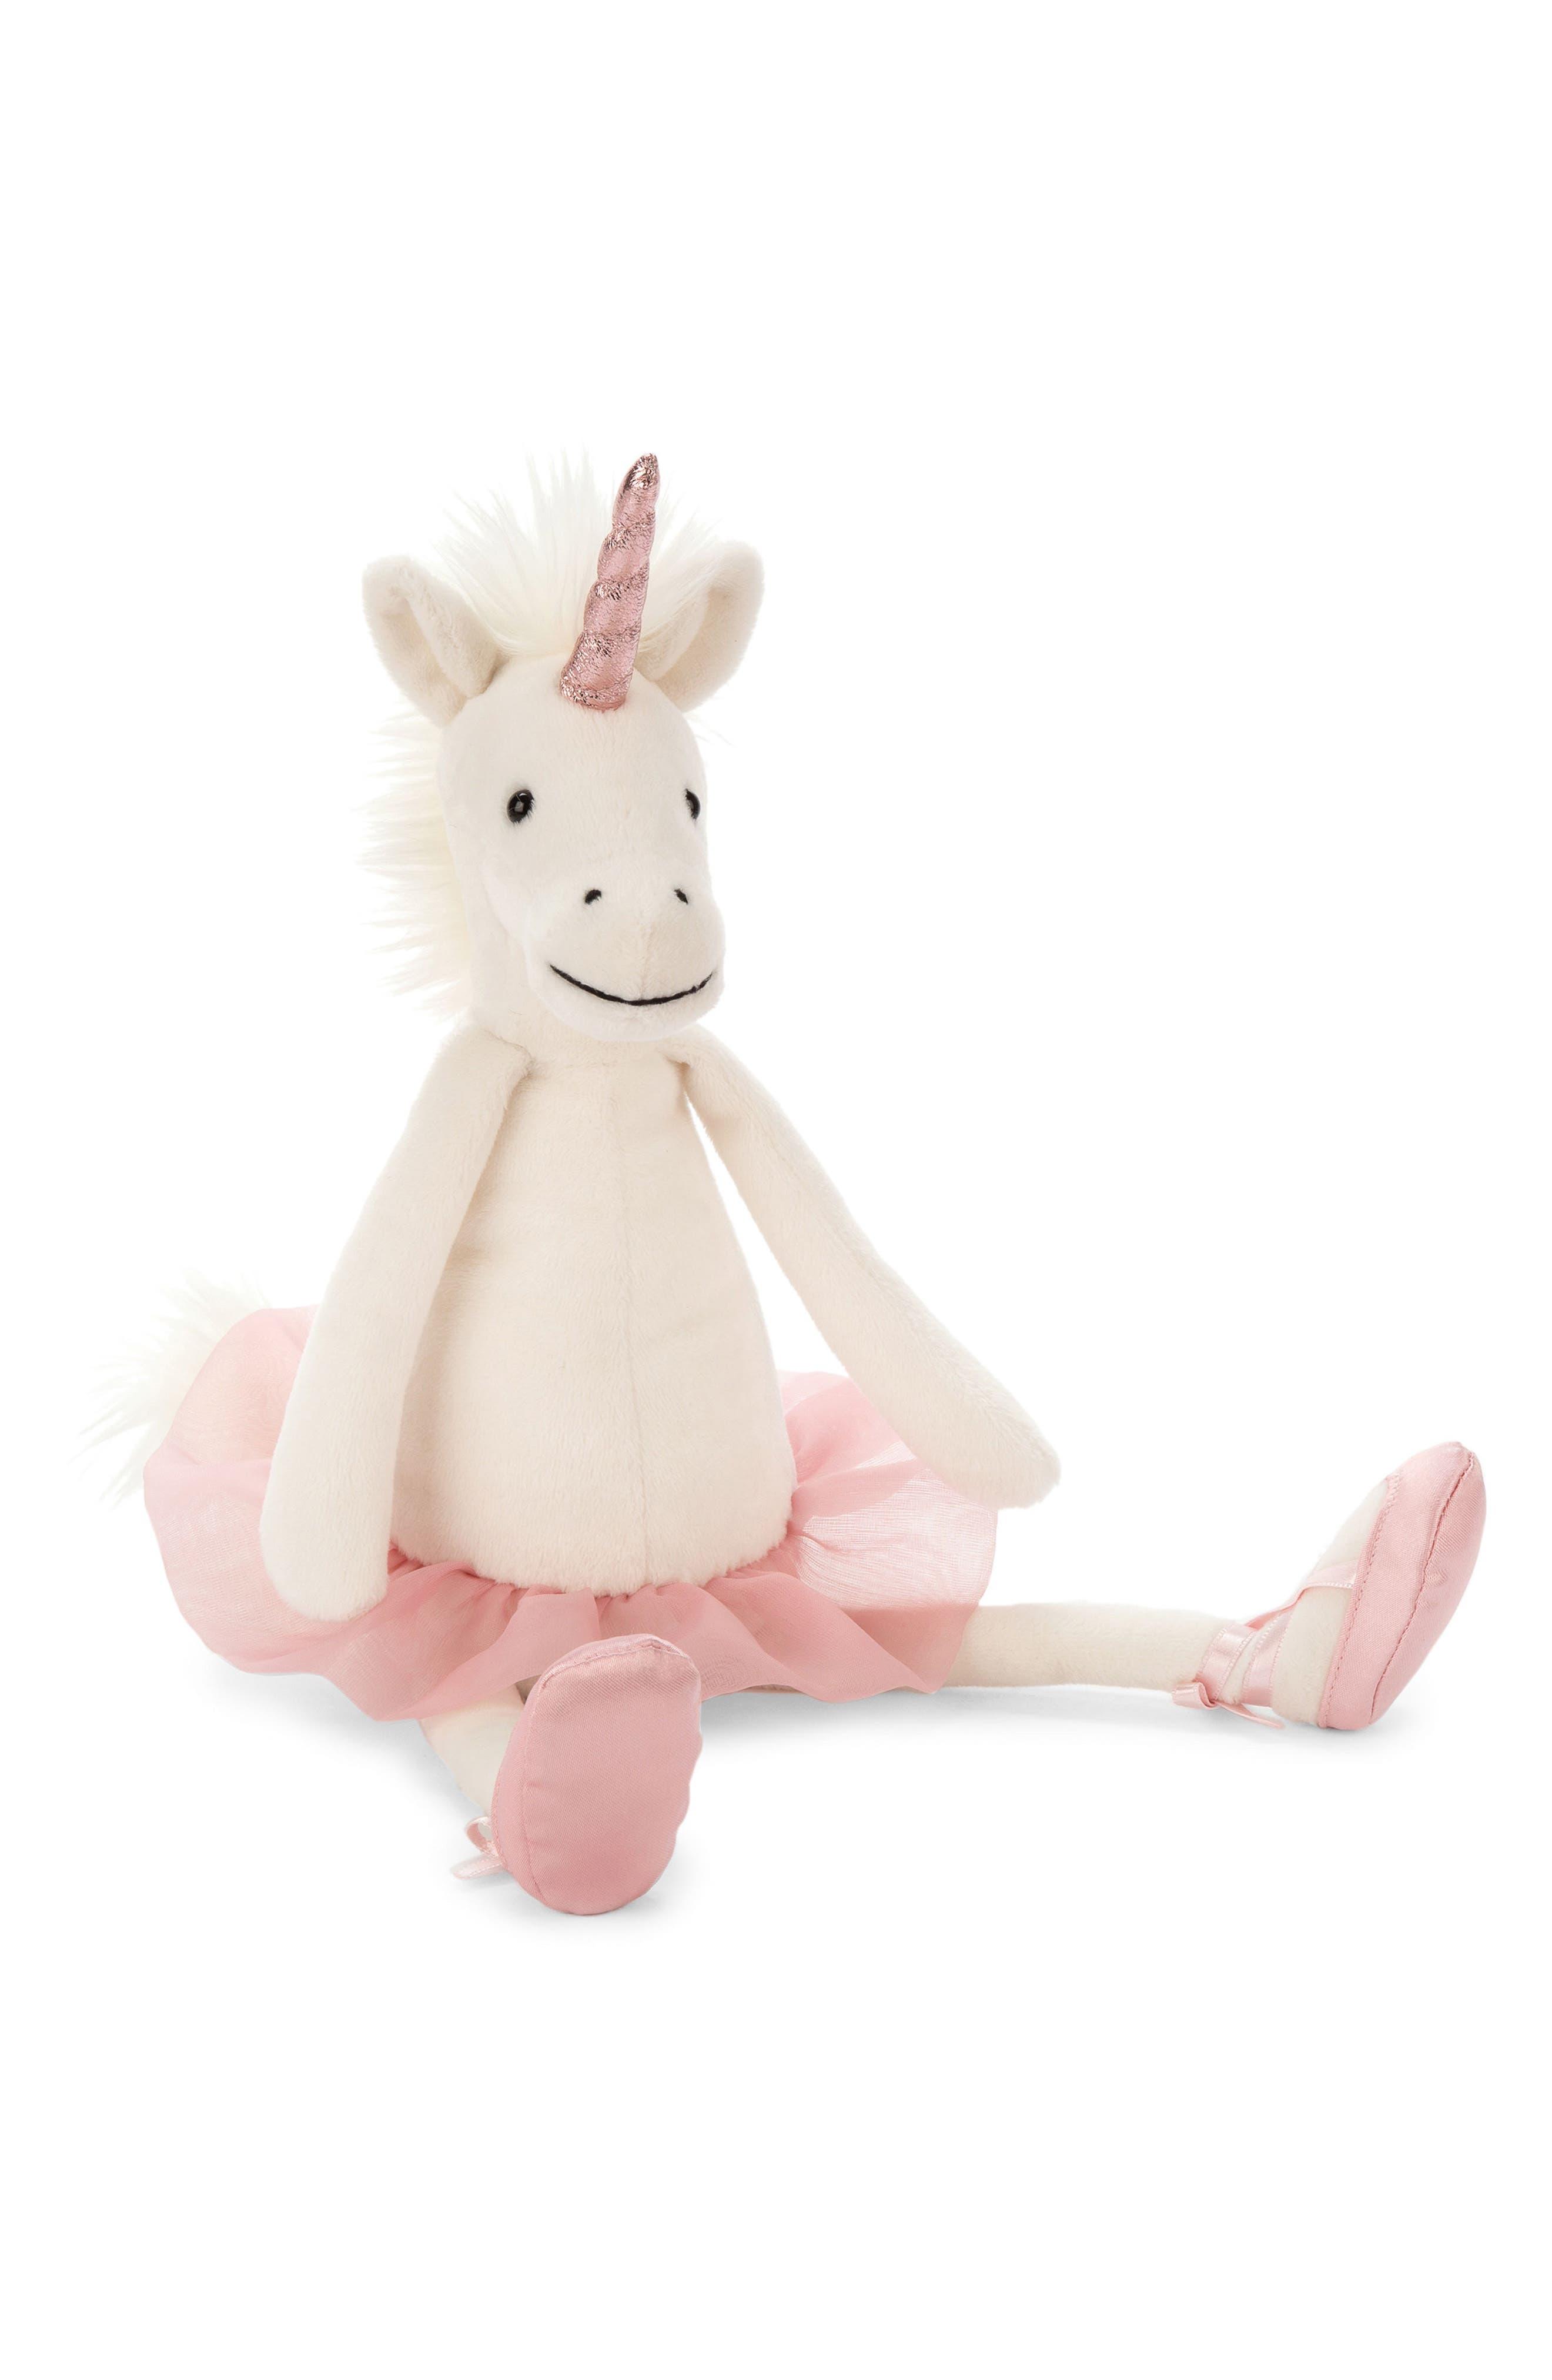 Dancing Darcy Unicorn Stuffed Animal,                             Main thumbnail 1, color,                             CREAM / PINK